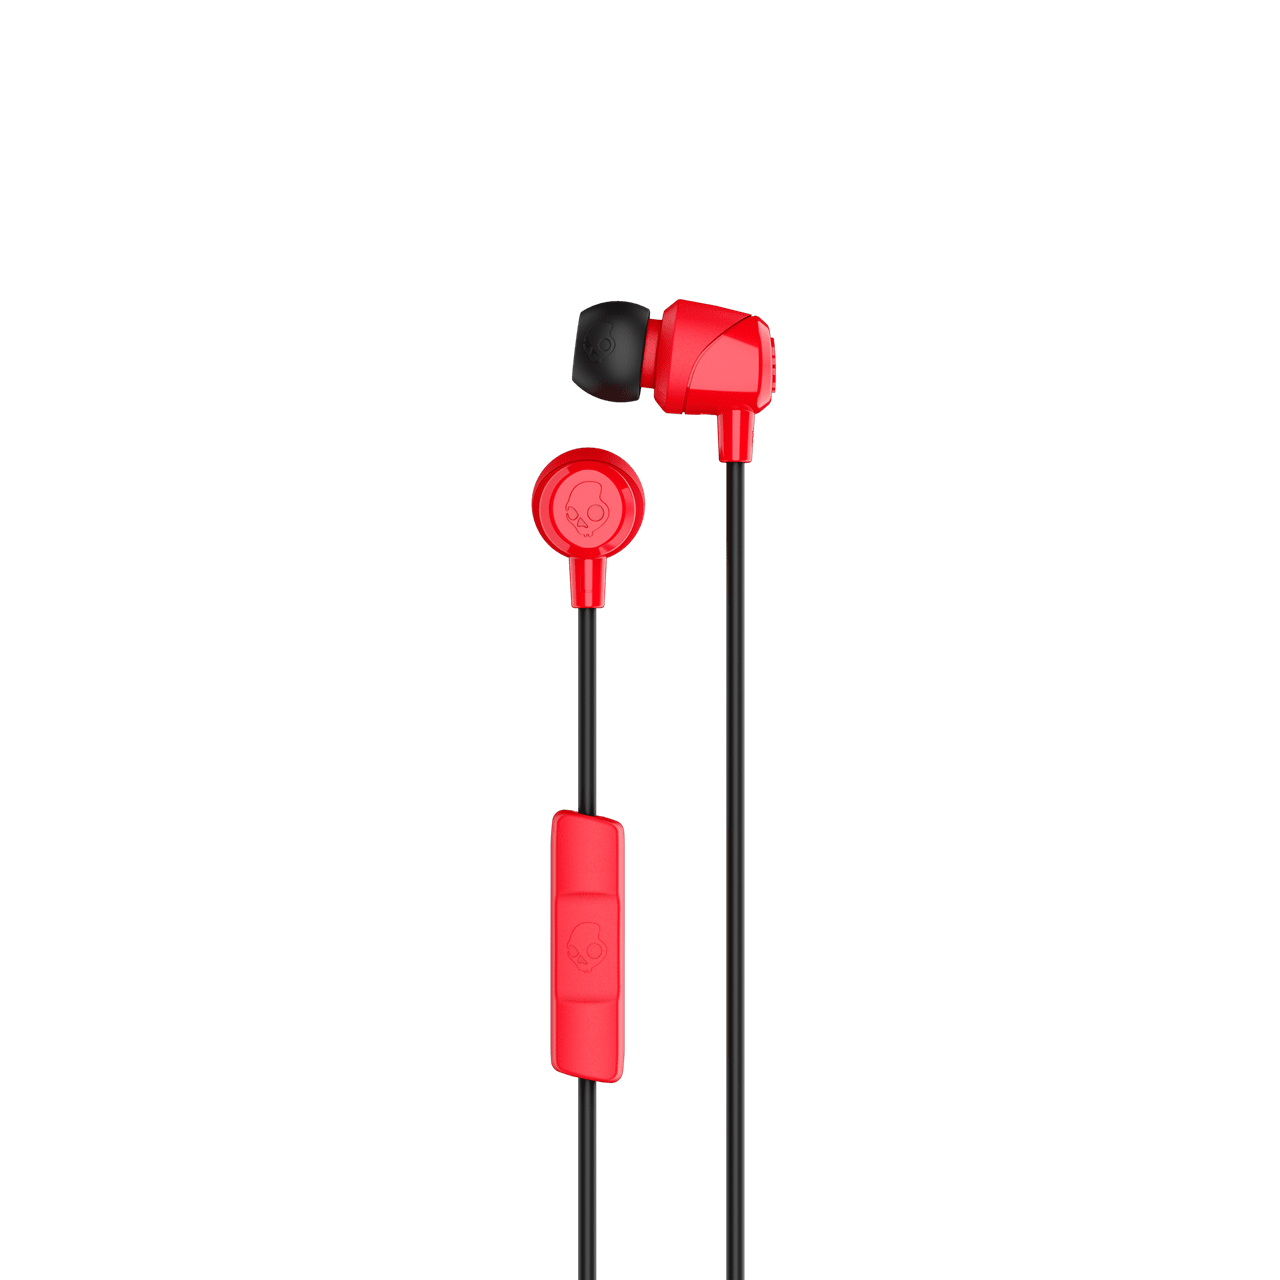 Skullcandy Jib Red/Black Earphones W/Mic - 2